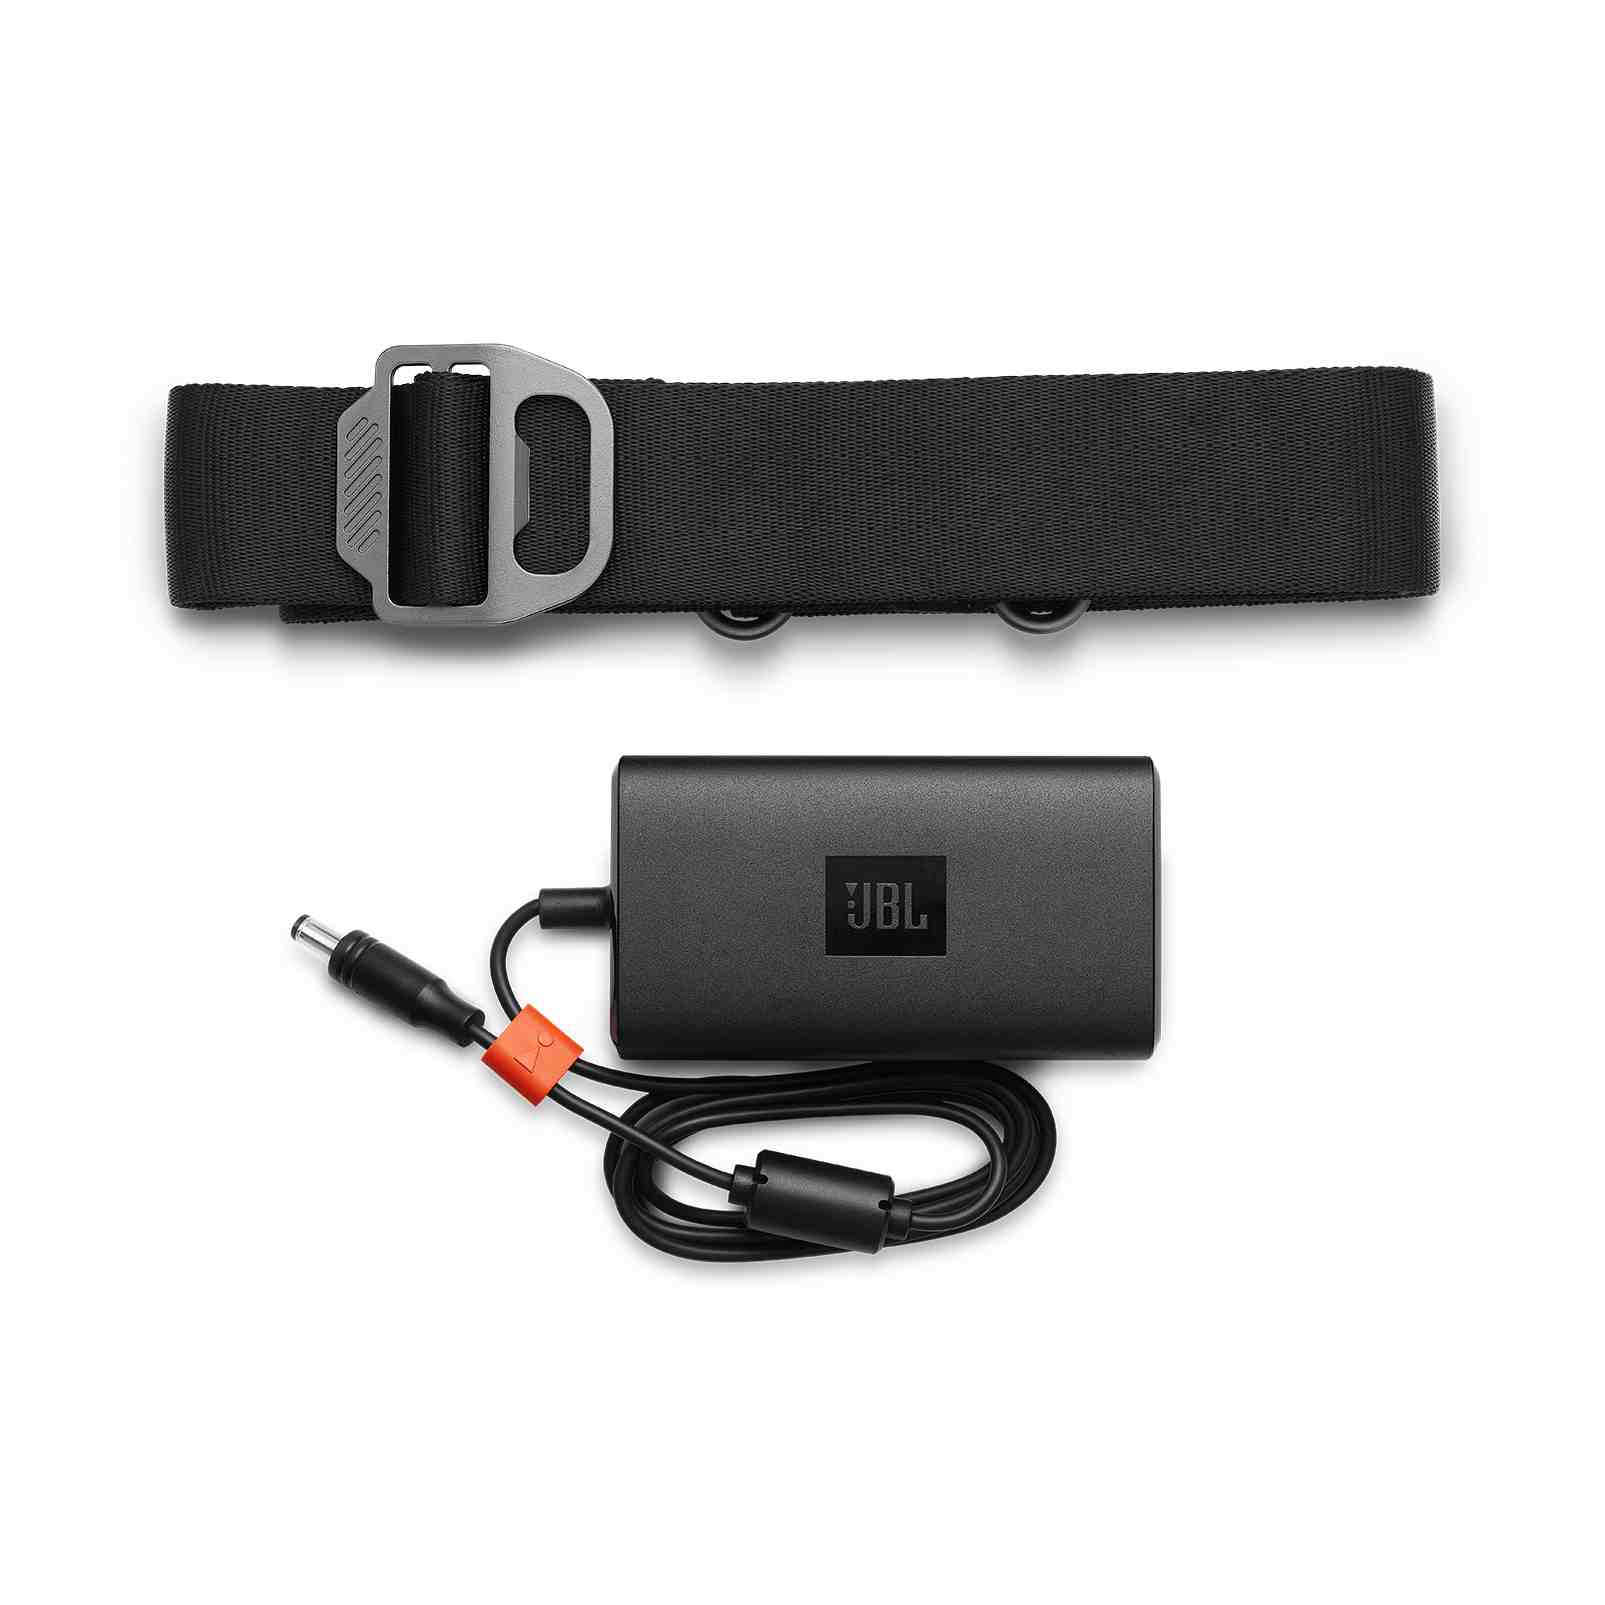 Caixa de Som Bluetooth Portátil JBL Xtreme 2 - Preto JBLXTREME2BLKBR